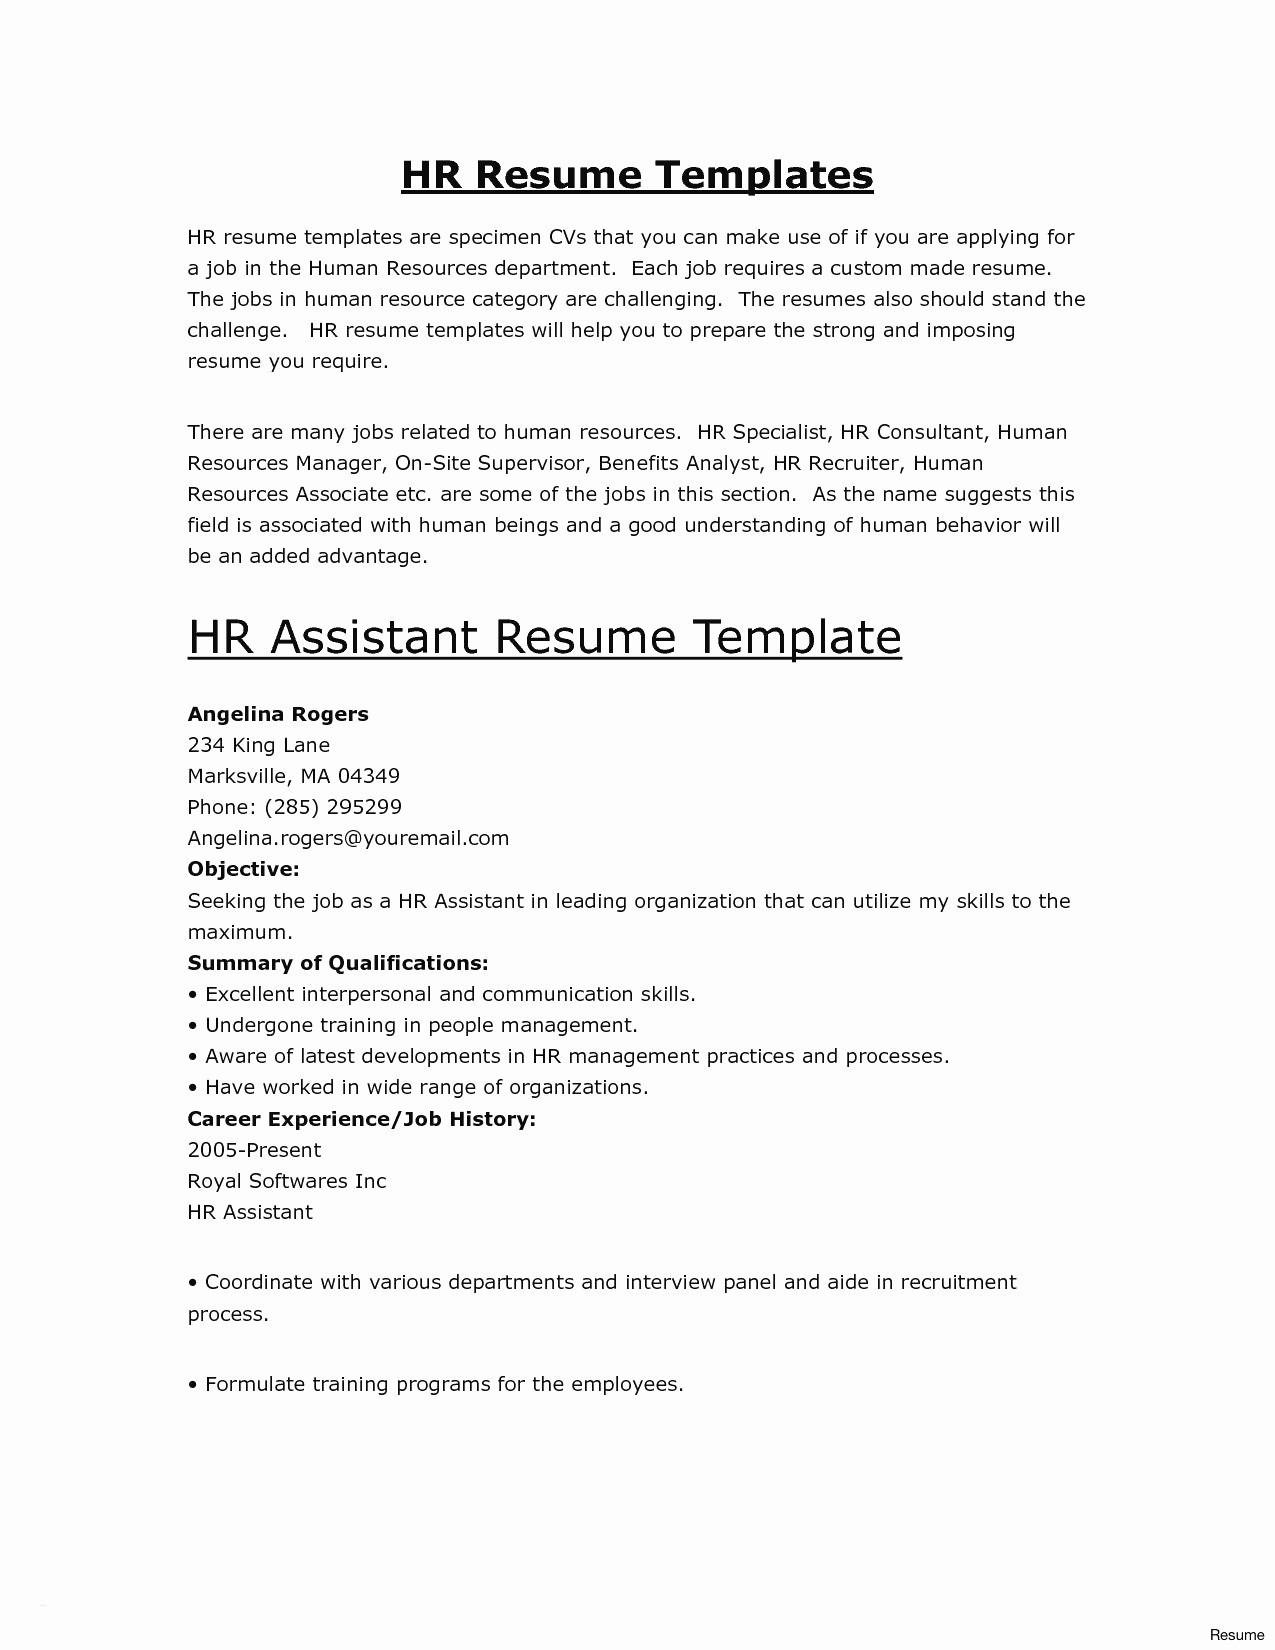 How To Type A Resume How To Type A Resume Unique How To Type A Resume Beautiful Self Employed Resume New Luxury Of How To Type A Resume how to type a resume|wikiresume.com